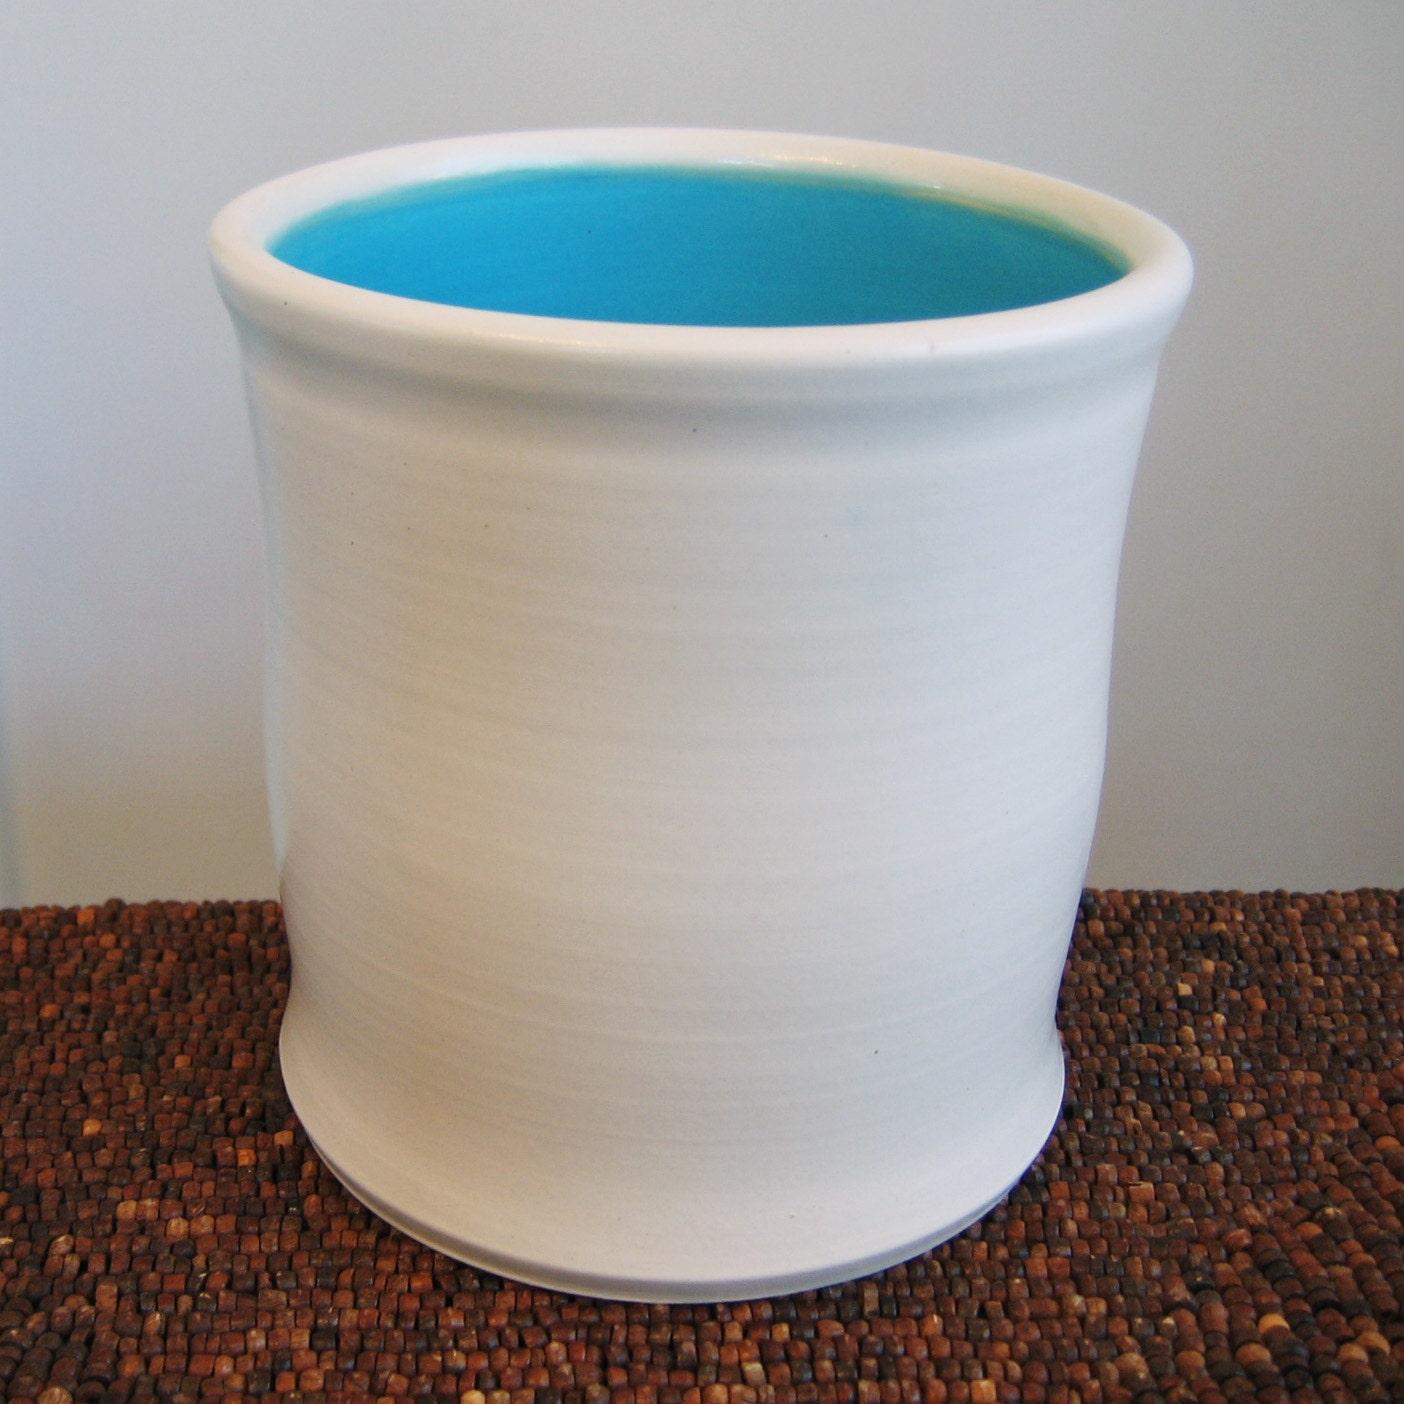 Ceramic Kitchen Utensil Crocks   Ceramic Utensil Crock In Turquoise Blue  Stoneware By